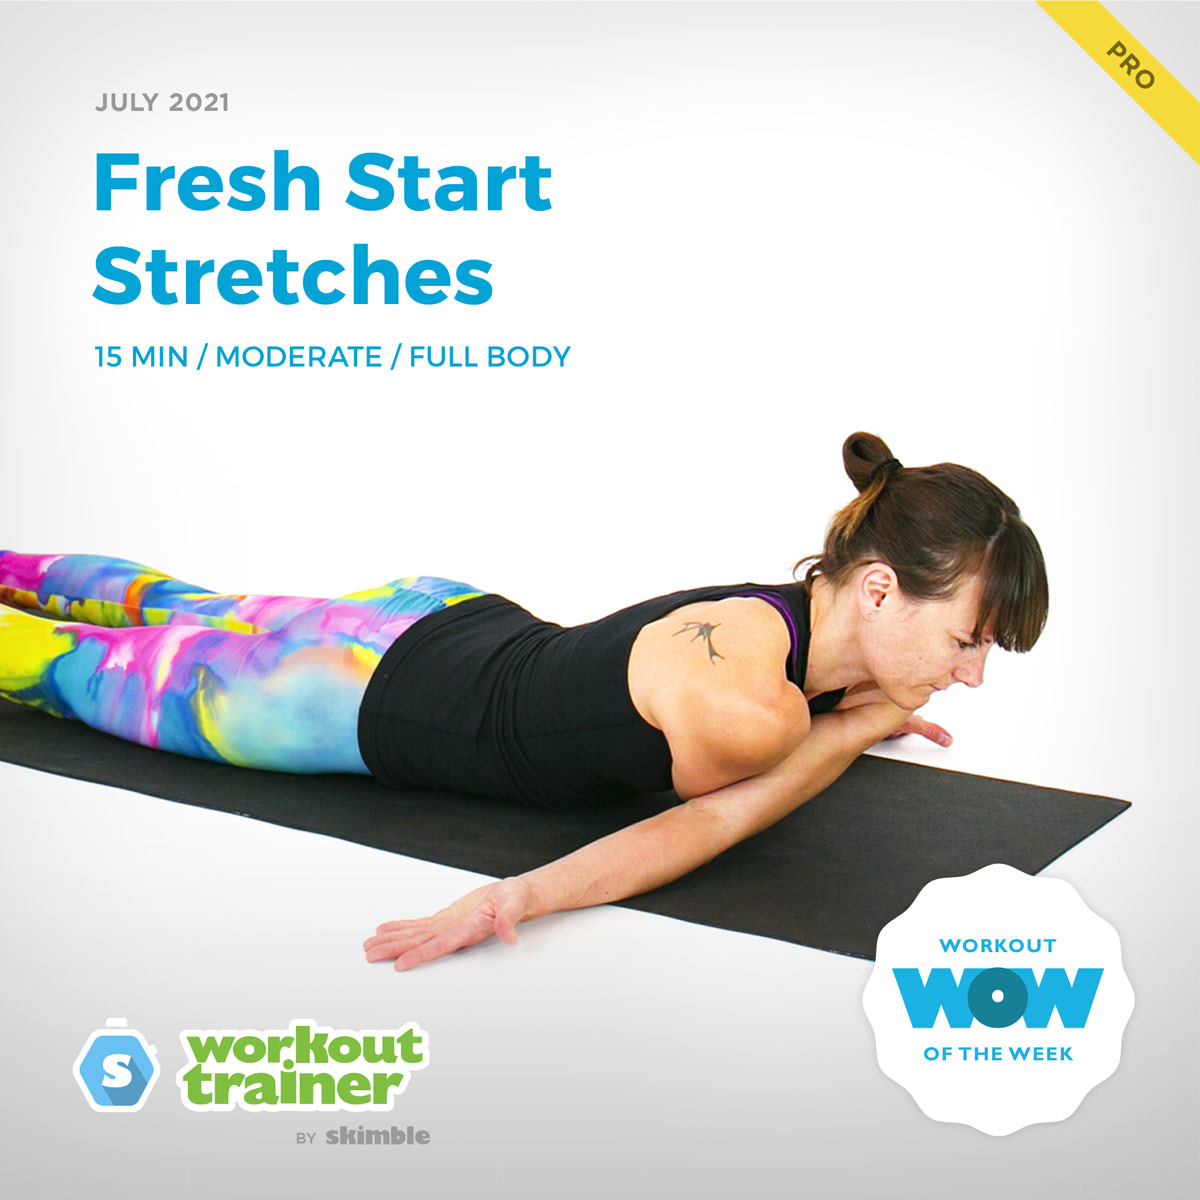 Female Yoga Instructor doing Downward Facing Deltoid Stretch on a yoga mat